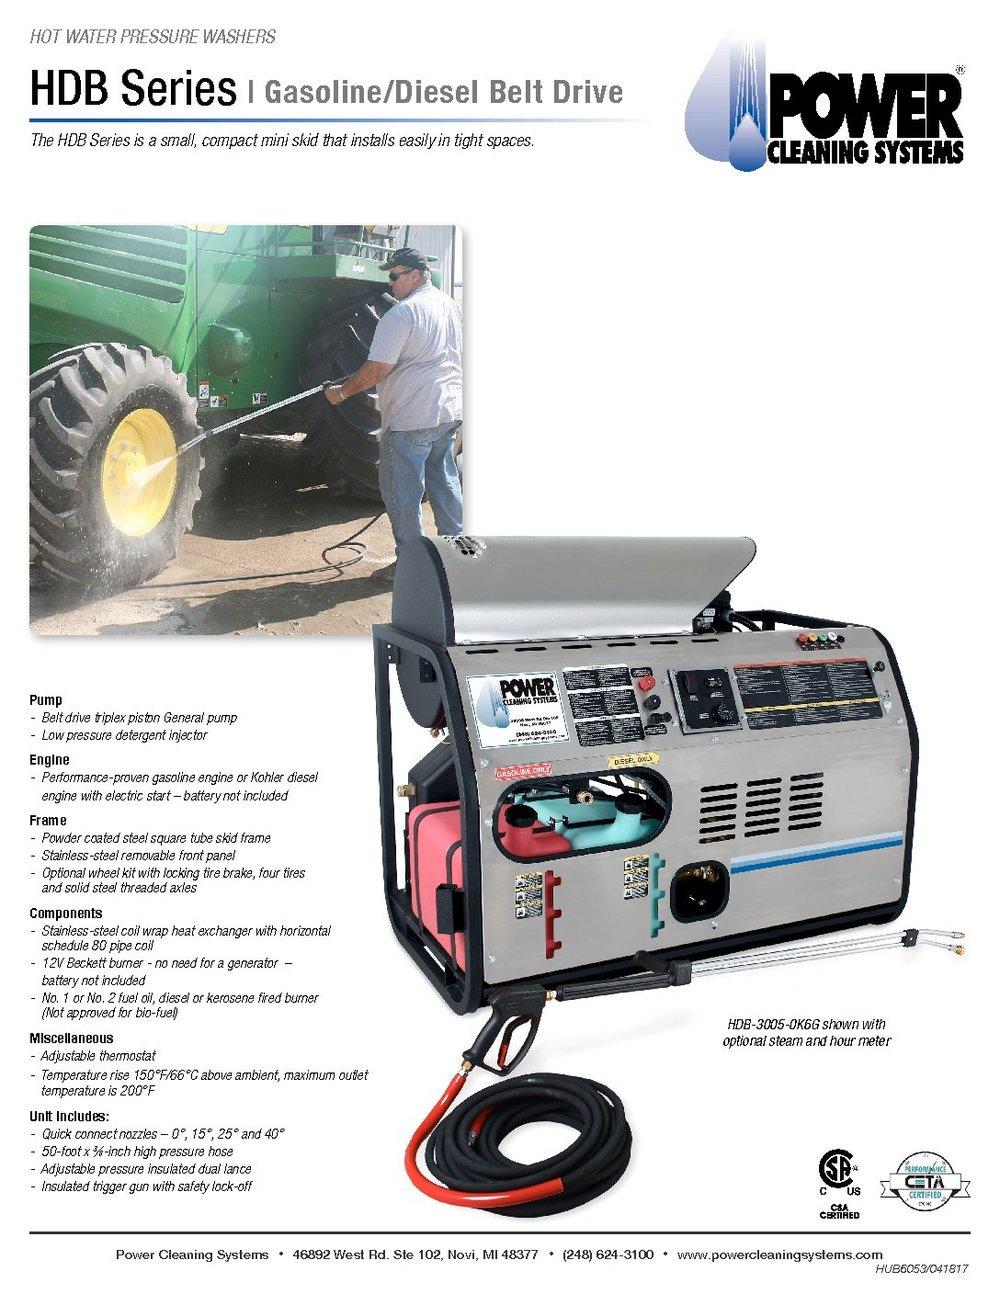 HDB-Series_Power-Cleaning-Systems-pdf.jpg